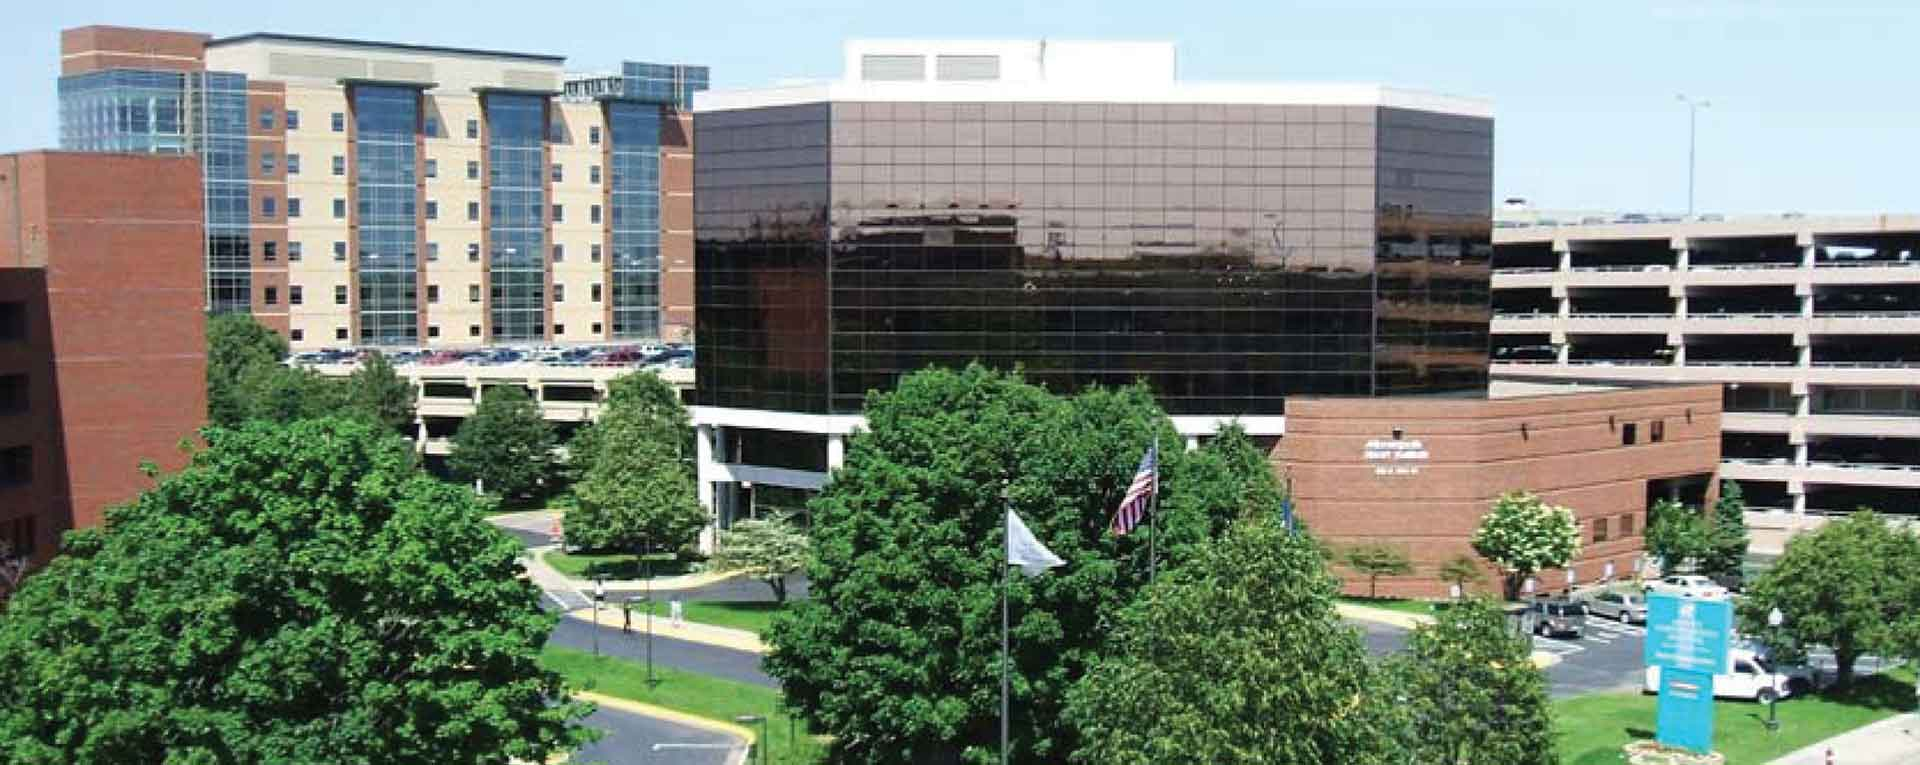 910 Medical & 920 Medical Buildings